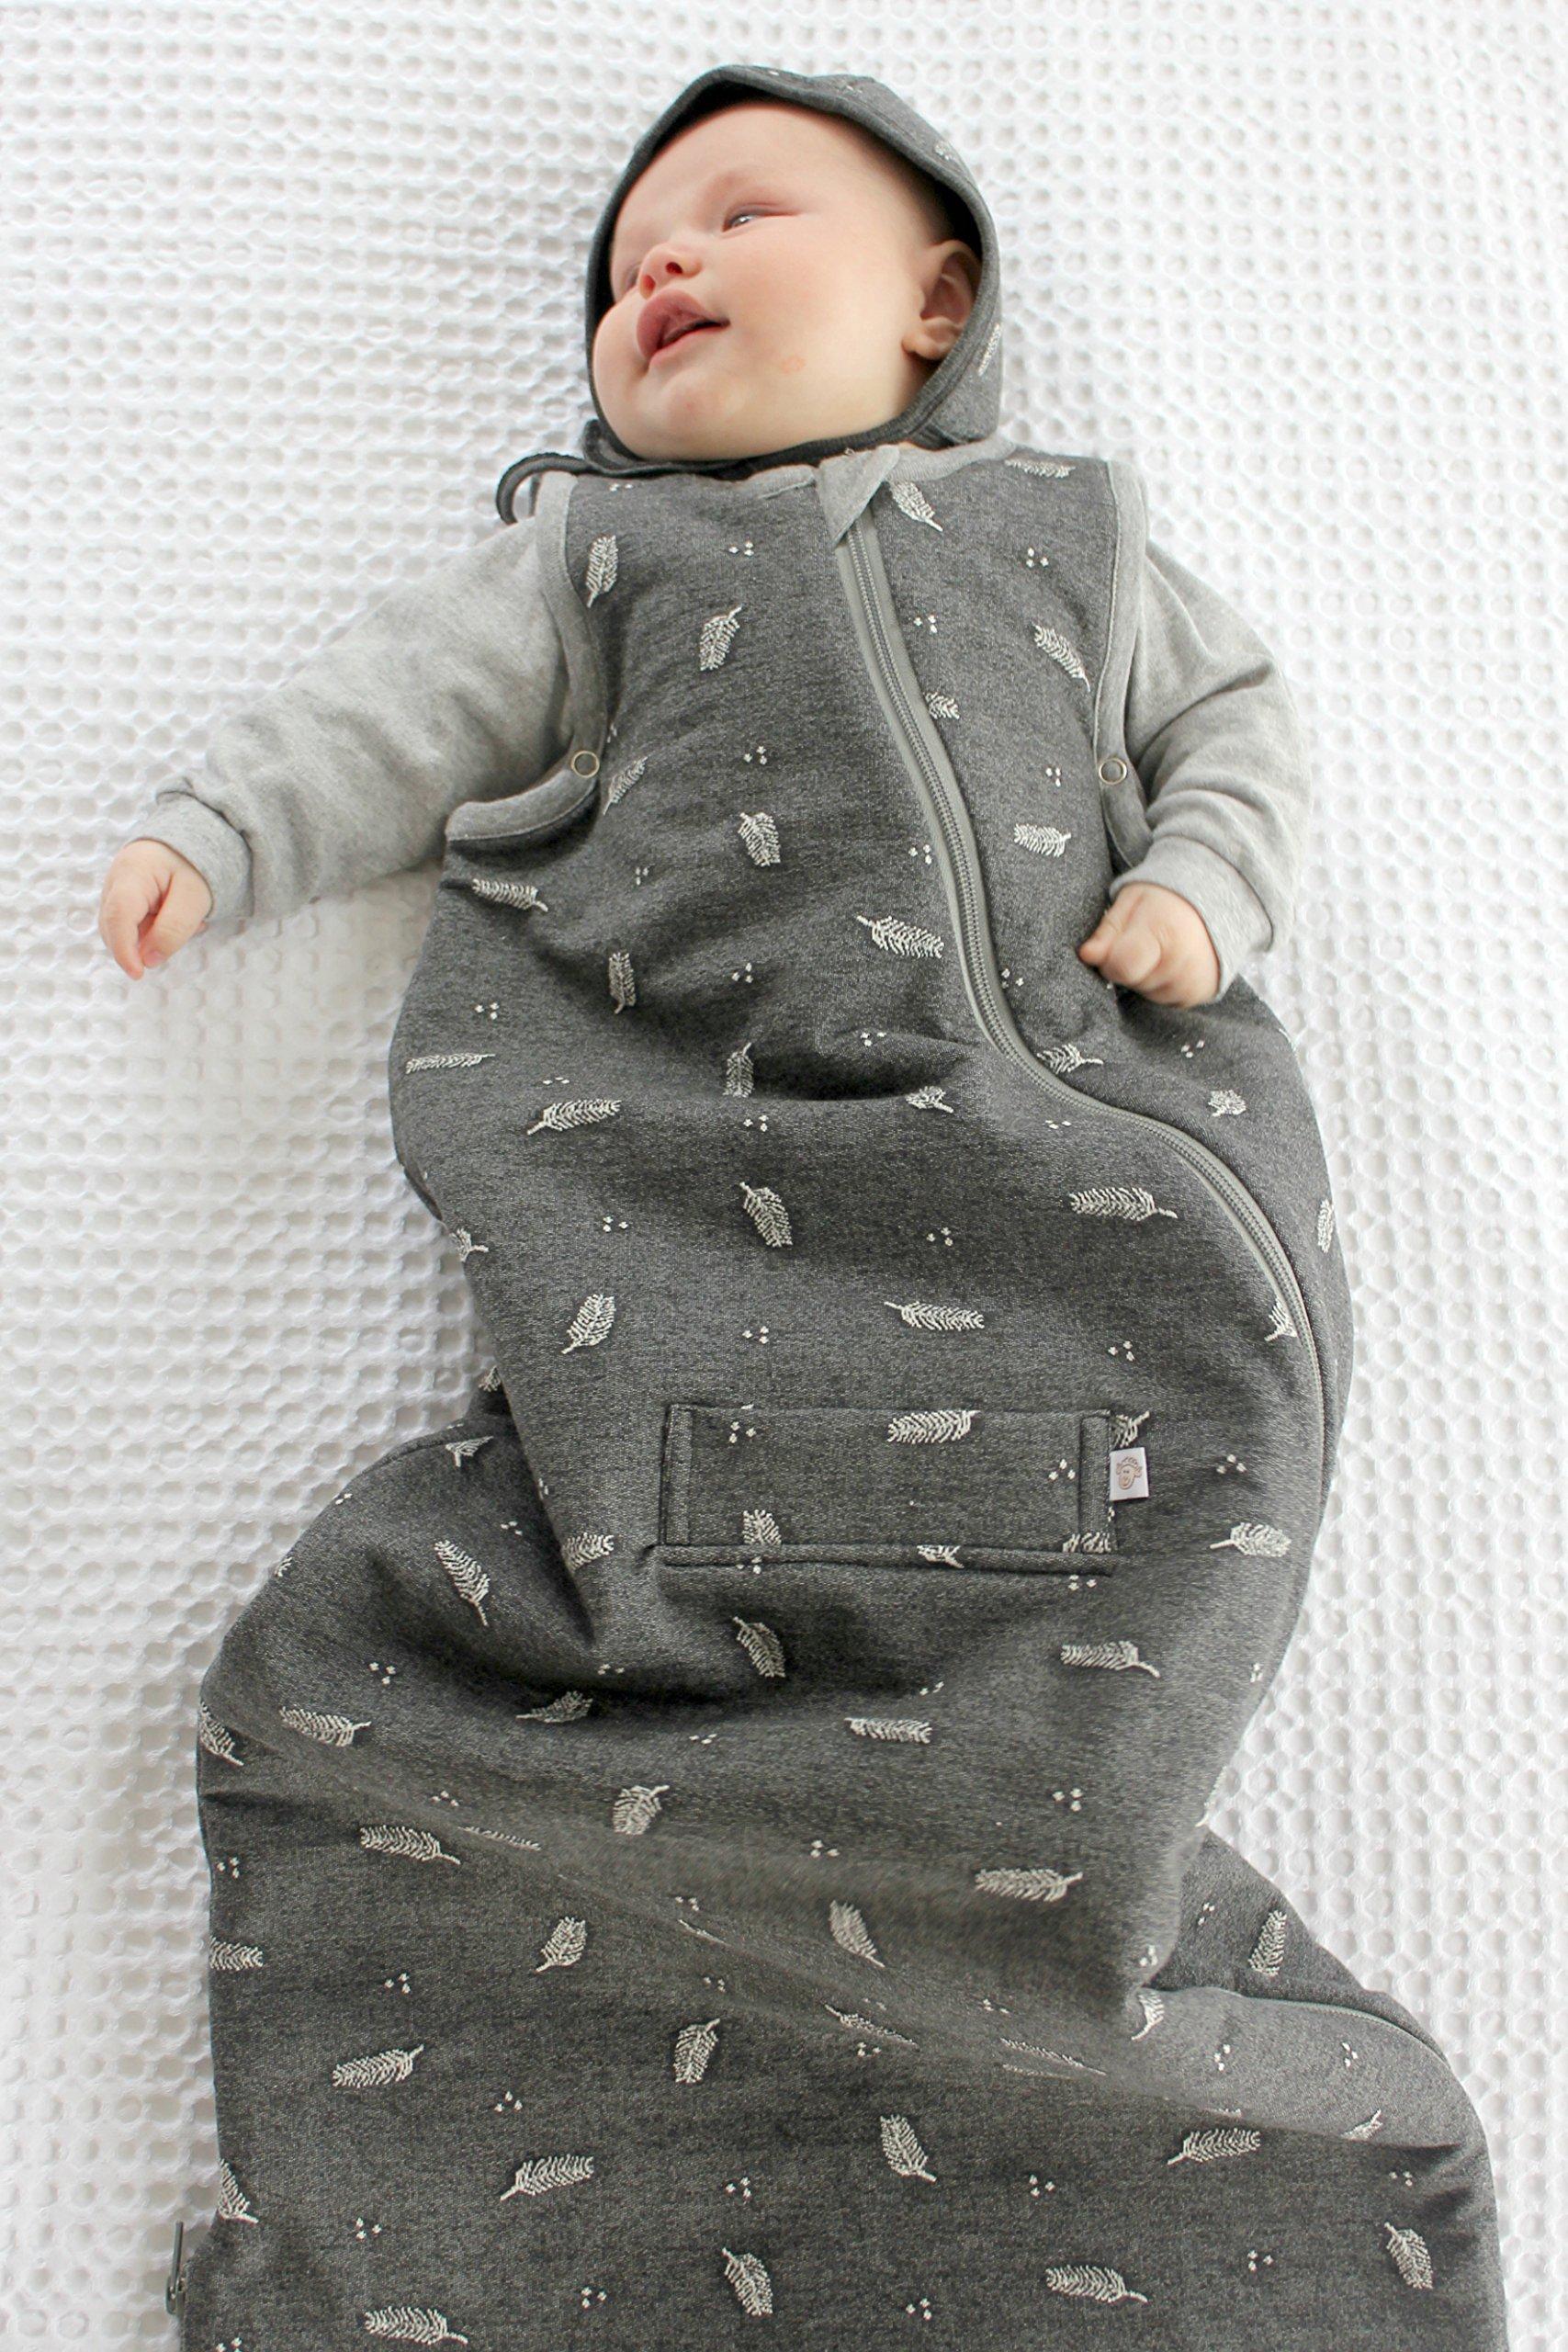 WINTER DUVET DELUXE MERINO baby Sleeping Bag/ Sleep Bag, 0-2 yrs old, Charcoal Feather